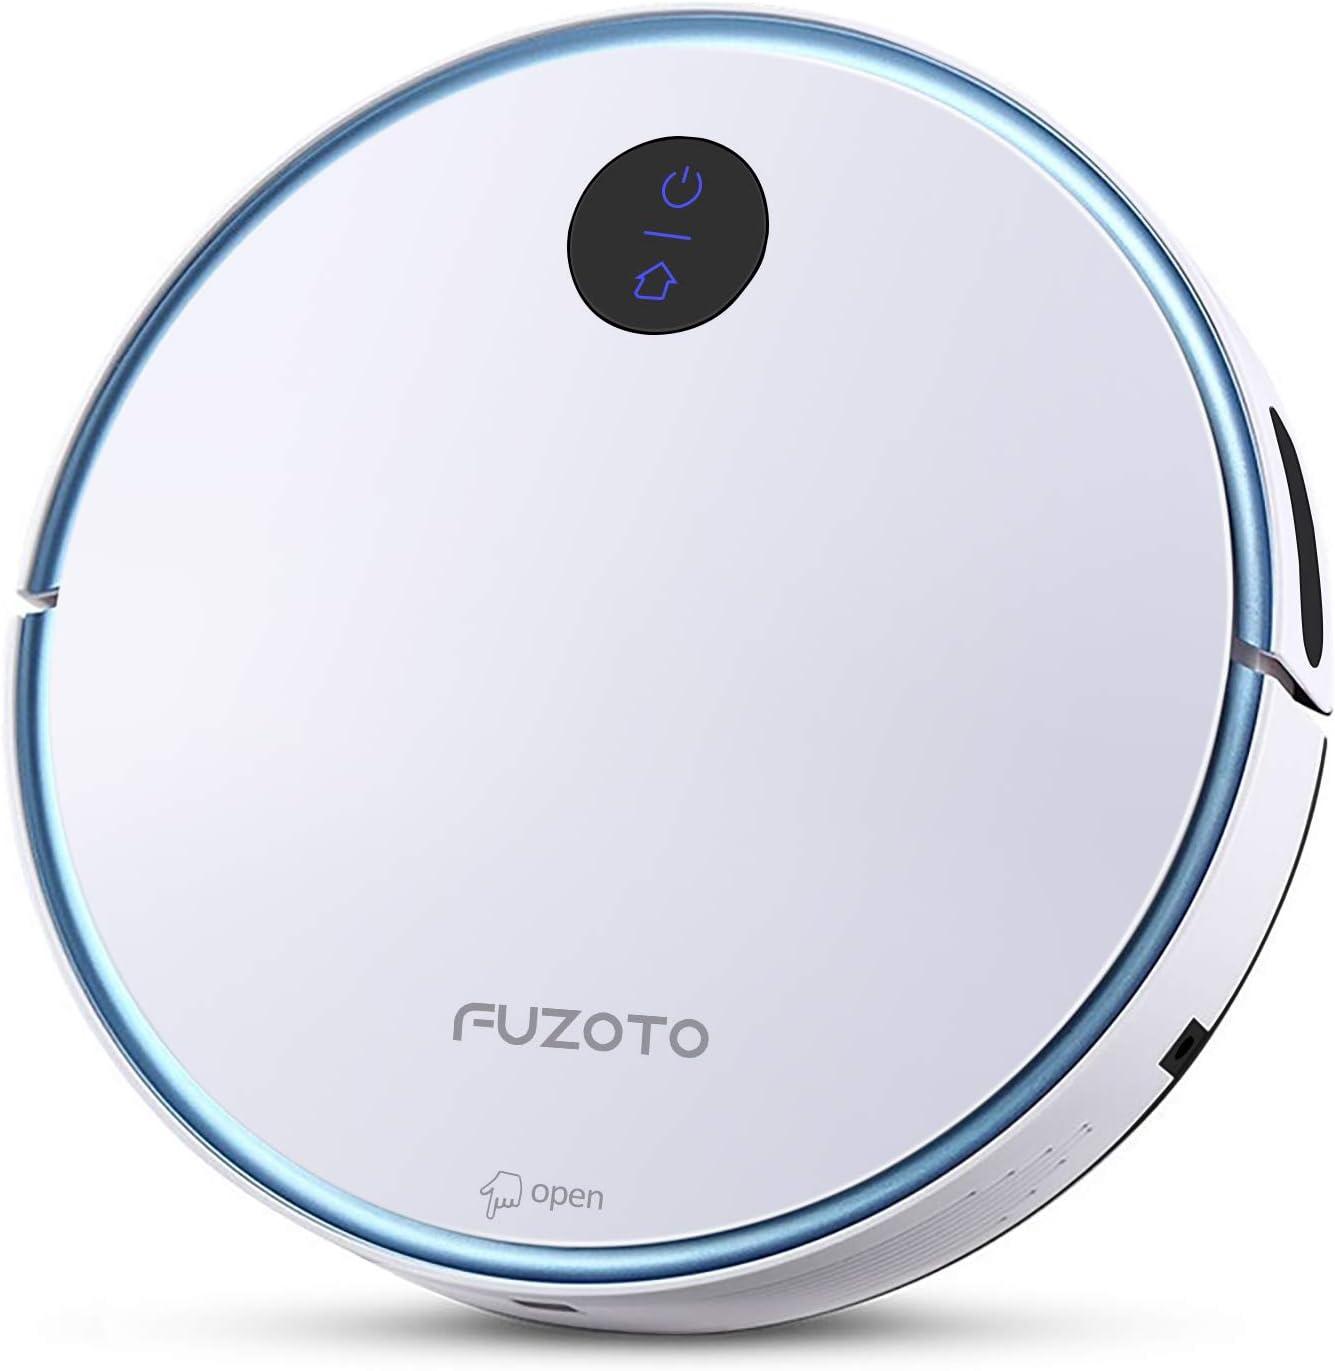 FUZOTO F6S Robot Vacuum Cleaner, Tangle-Free 1500Pa Suction, Automatic Self-Charging Robotic Vacuum, WiFi/App/Alexa, Super Quiet Cleaning Robot for Pet Hair, Low-Pile Carpet, Hard Floor, White